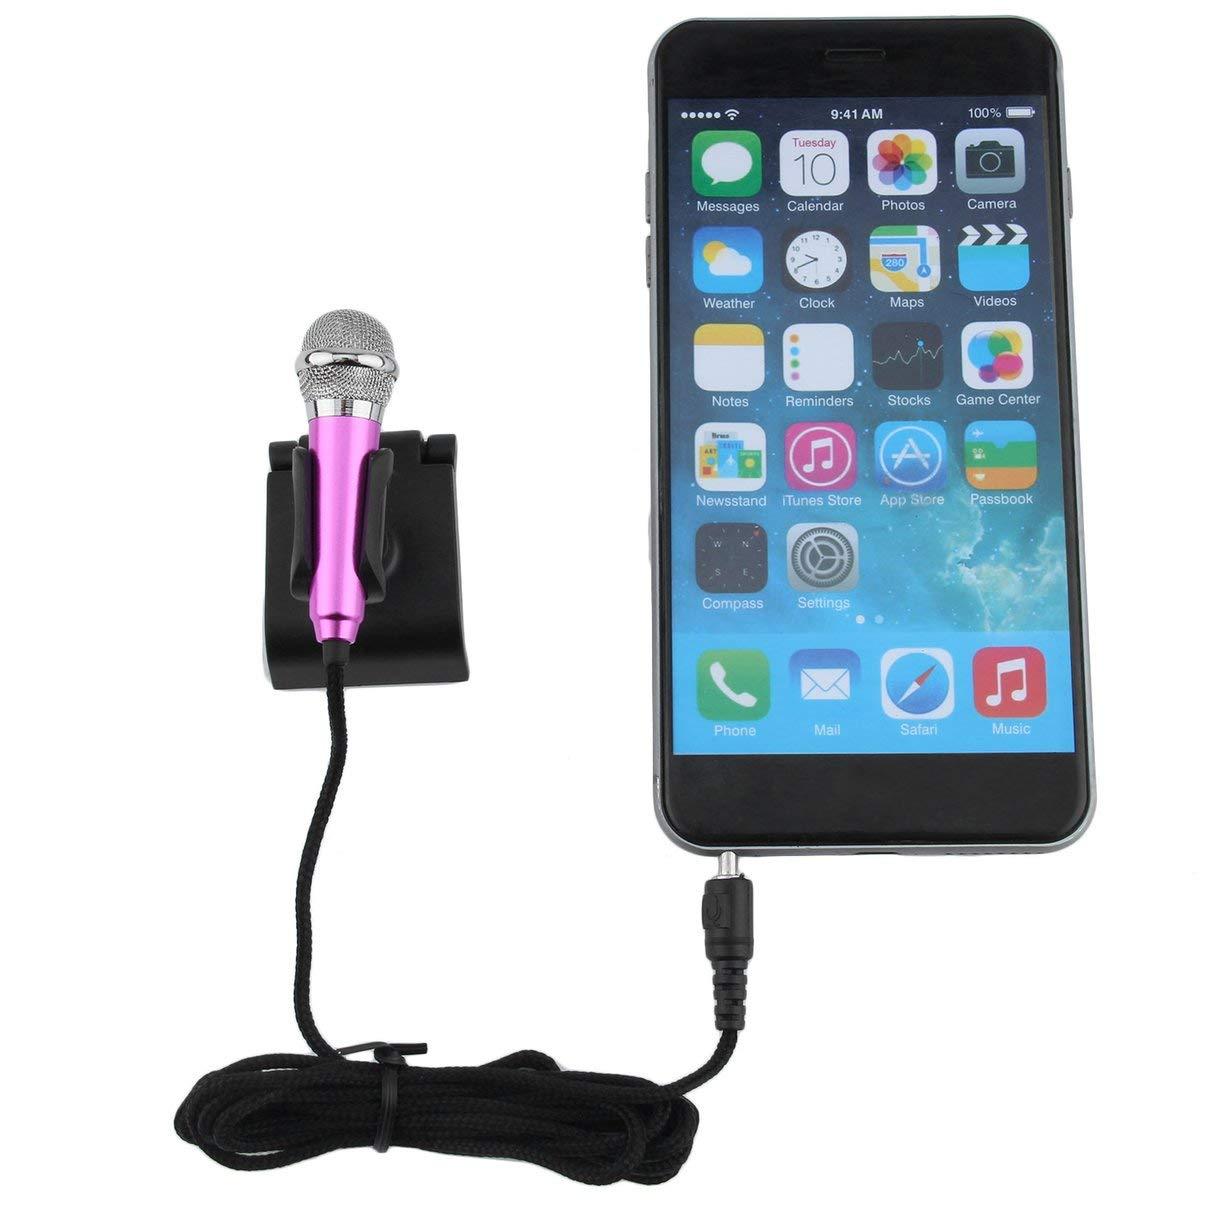 Mini aleaci/ón de aluminio port/átil 3.5mm con cable micr/ófono para tel/éfono m/óvil Tablet PC port/átil Speech Sing Karaoke para iPhone